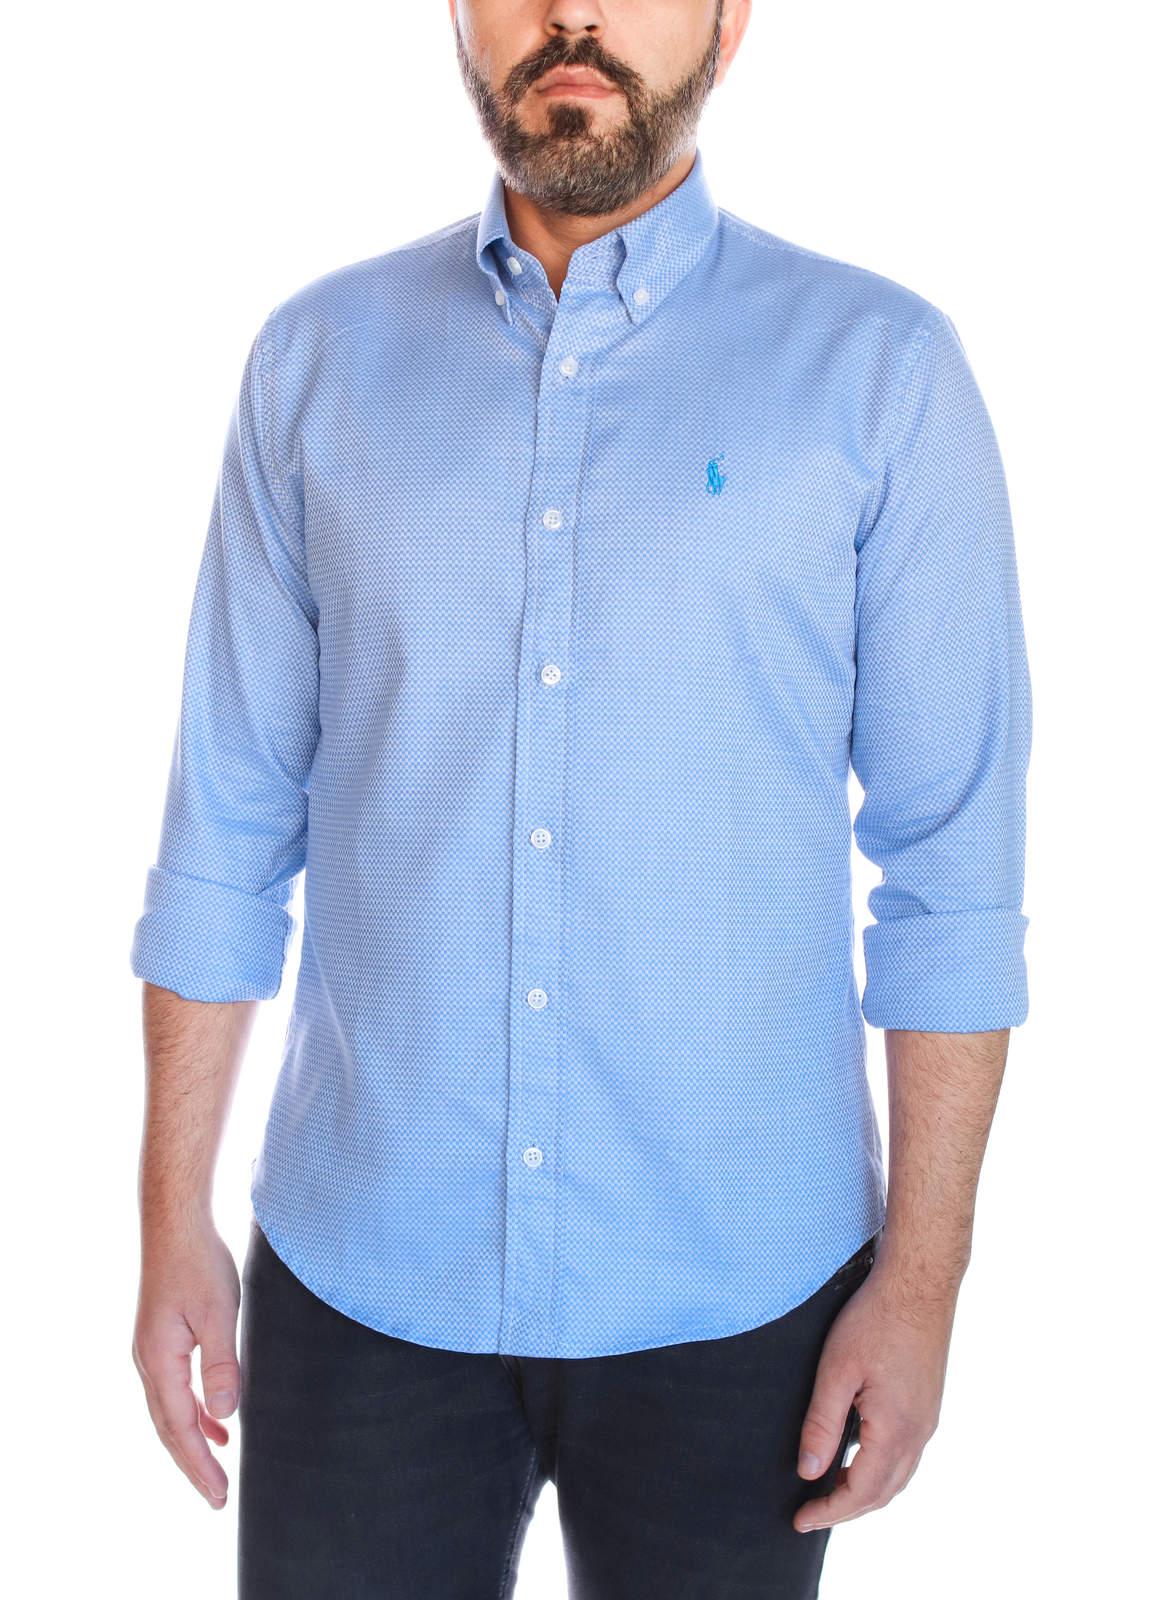 Camisa Social Polo Ralph Lauren Custom Fit Textured Azul Claro